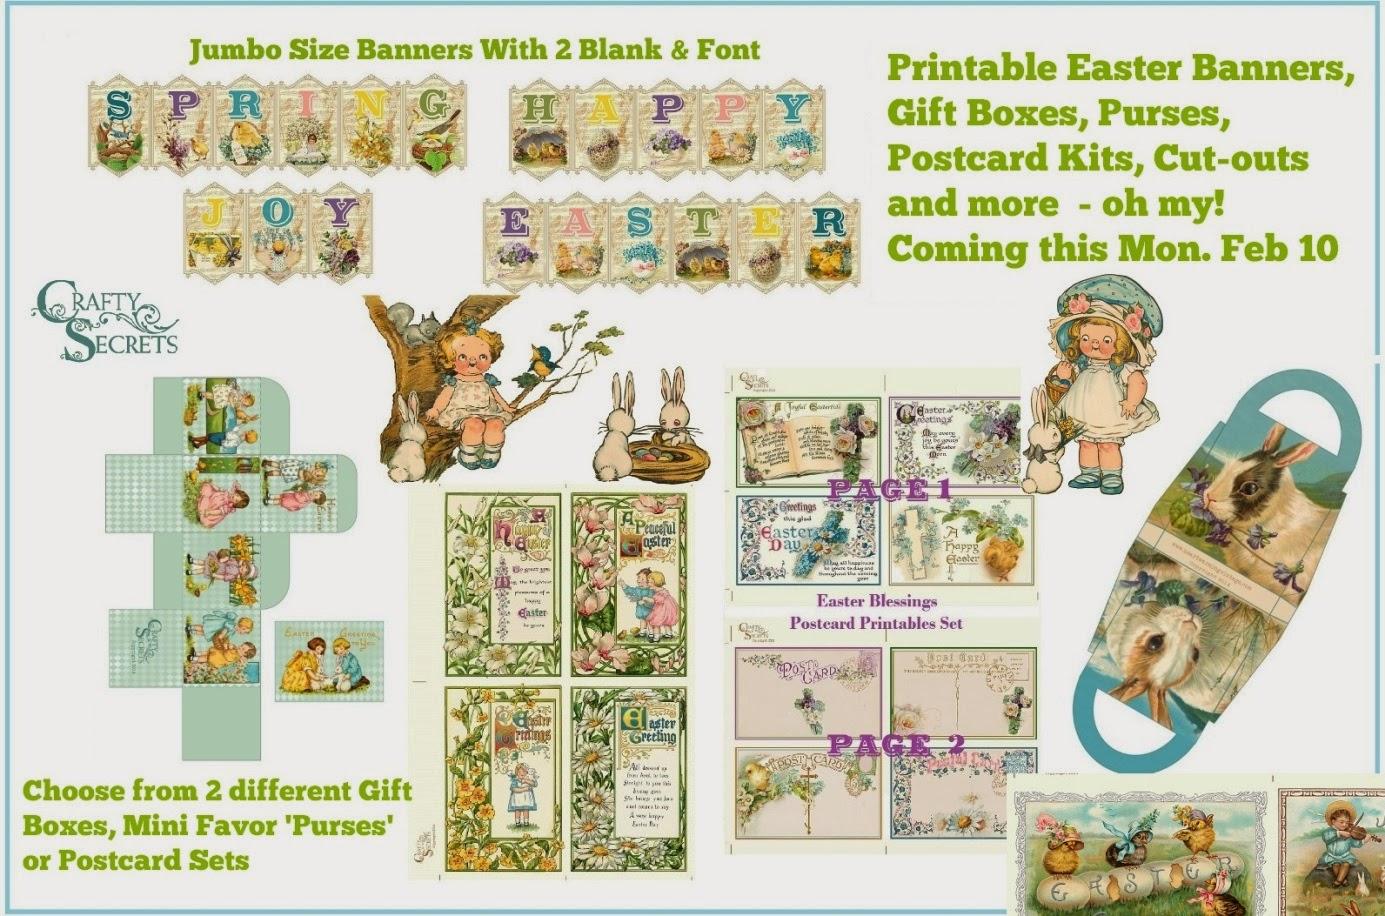 http://3.bp.blogspot.com/--dFDpPEJIGI/UvT8w4SvLpI/AAAAAAAAQsM/BwG32aNZUH4/s1600/Ad-Easter-Printable-web.jpg